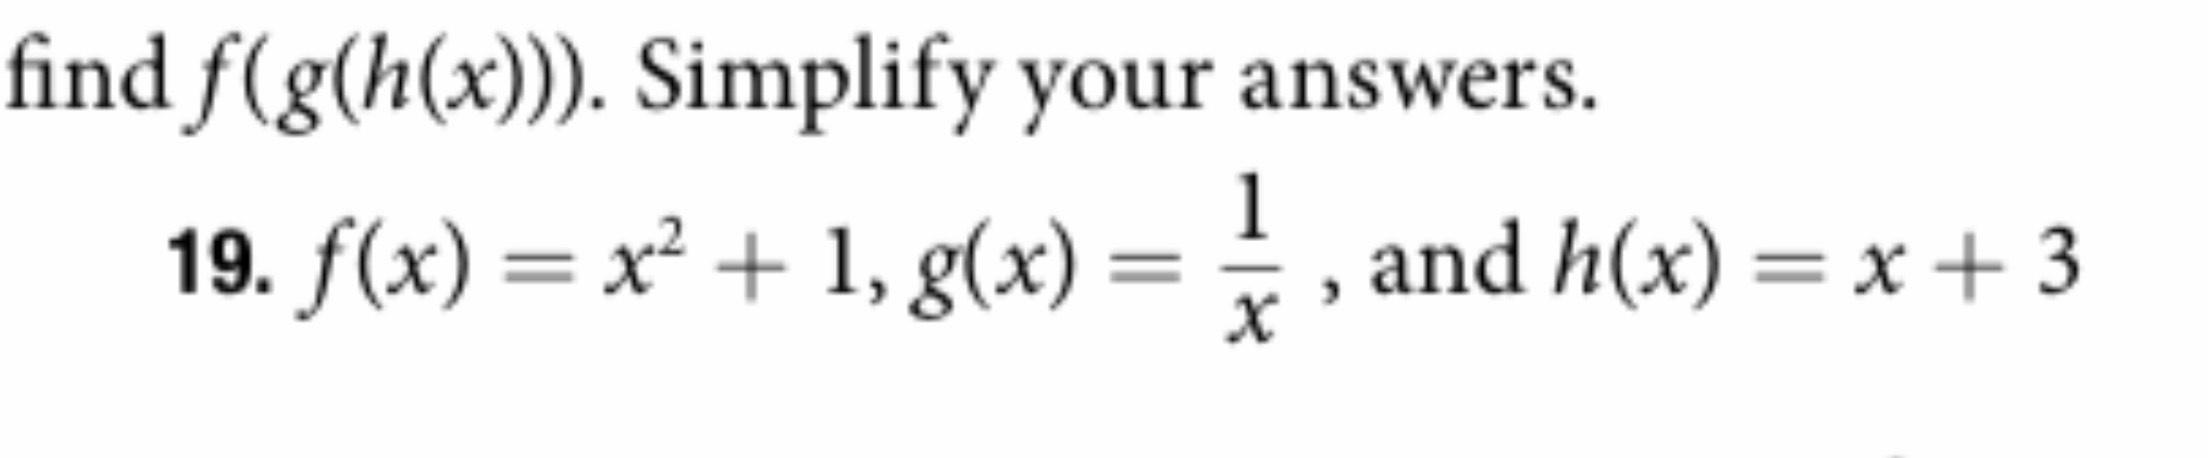 |find f(g(h(x)). Simplify your answers. 1 19. f(x) x1, g(x) and h(x) = x+3 X